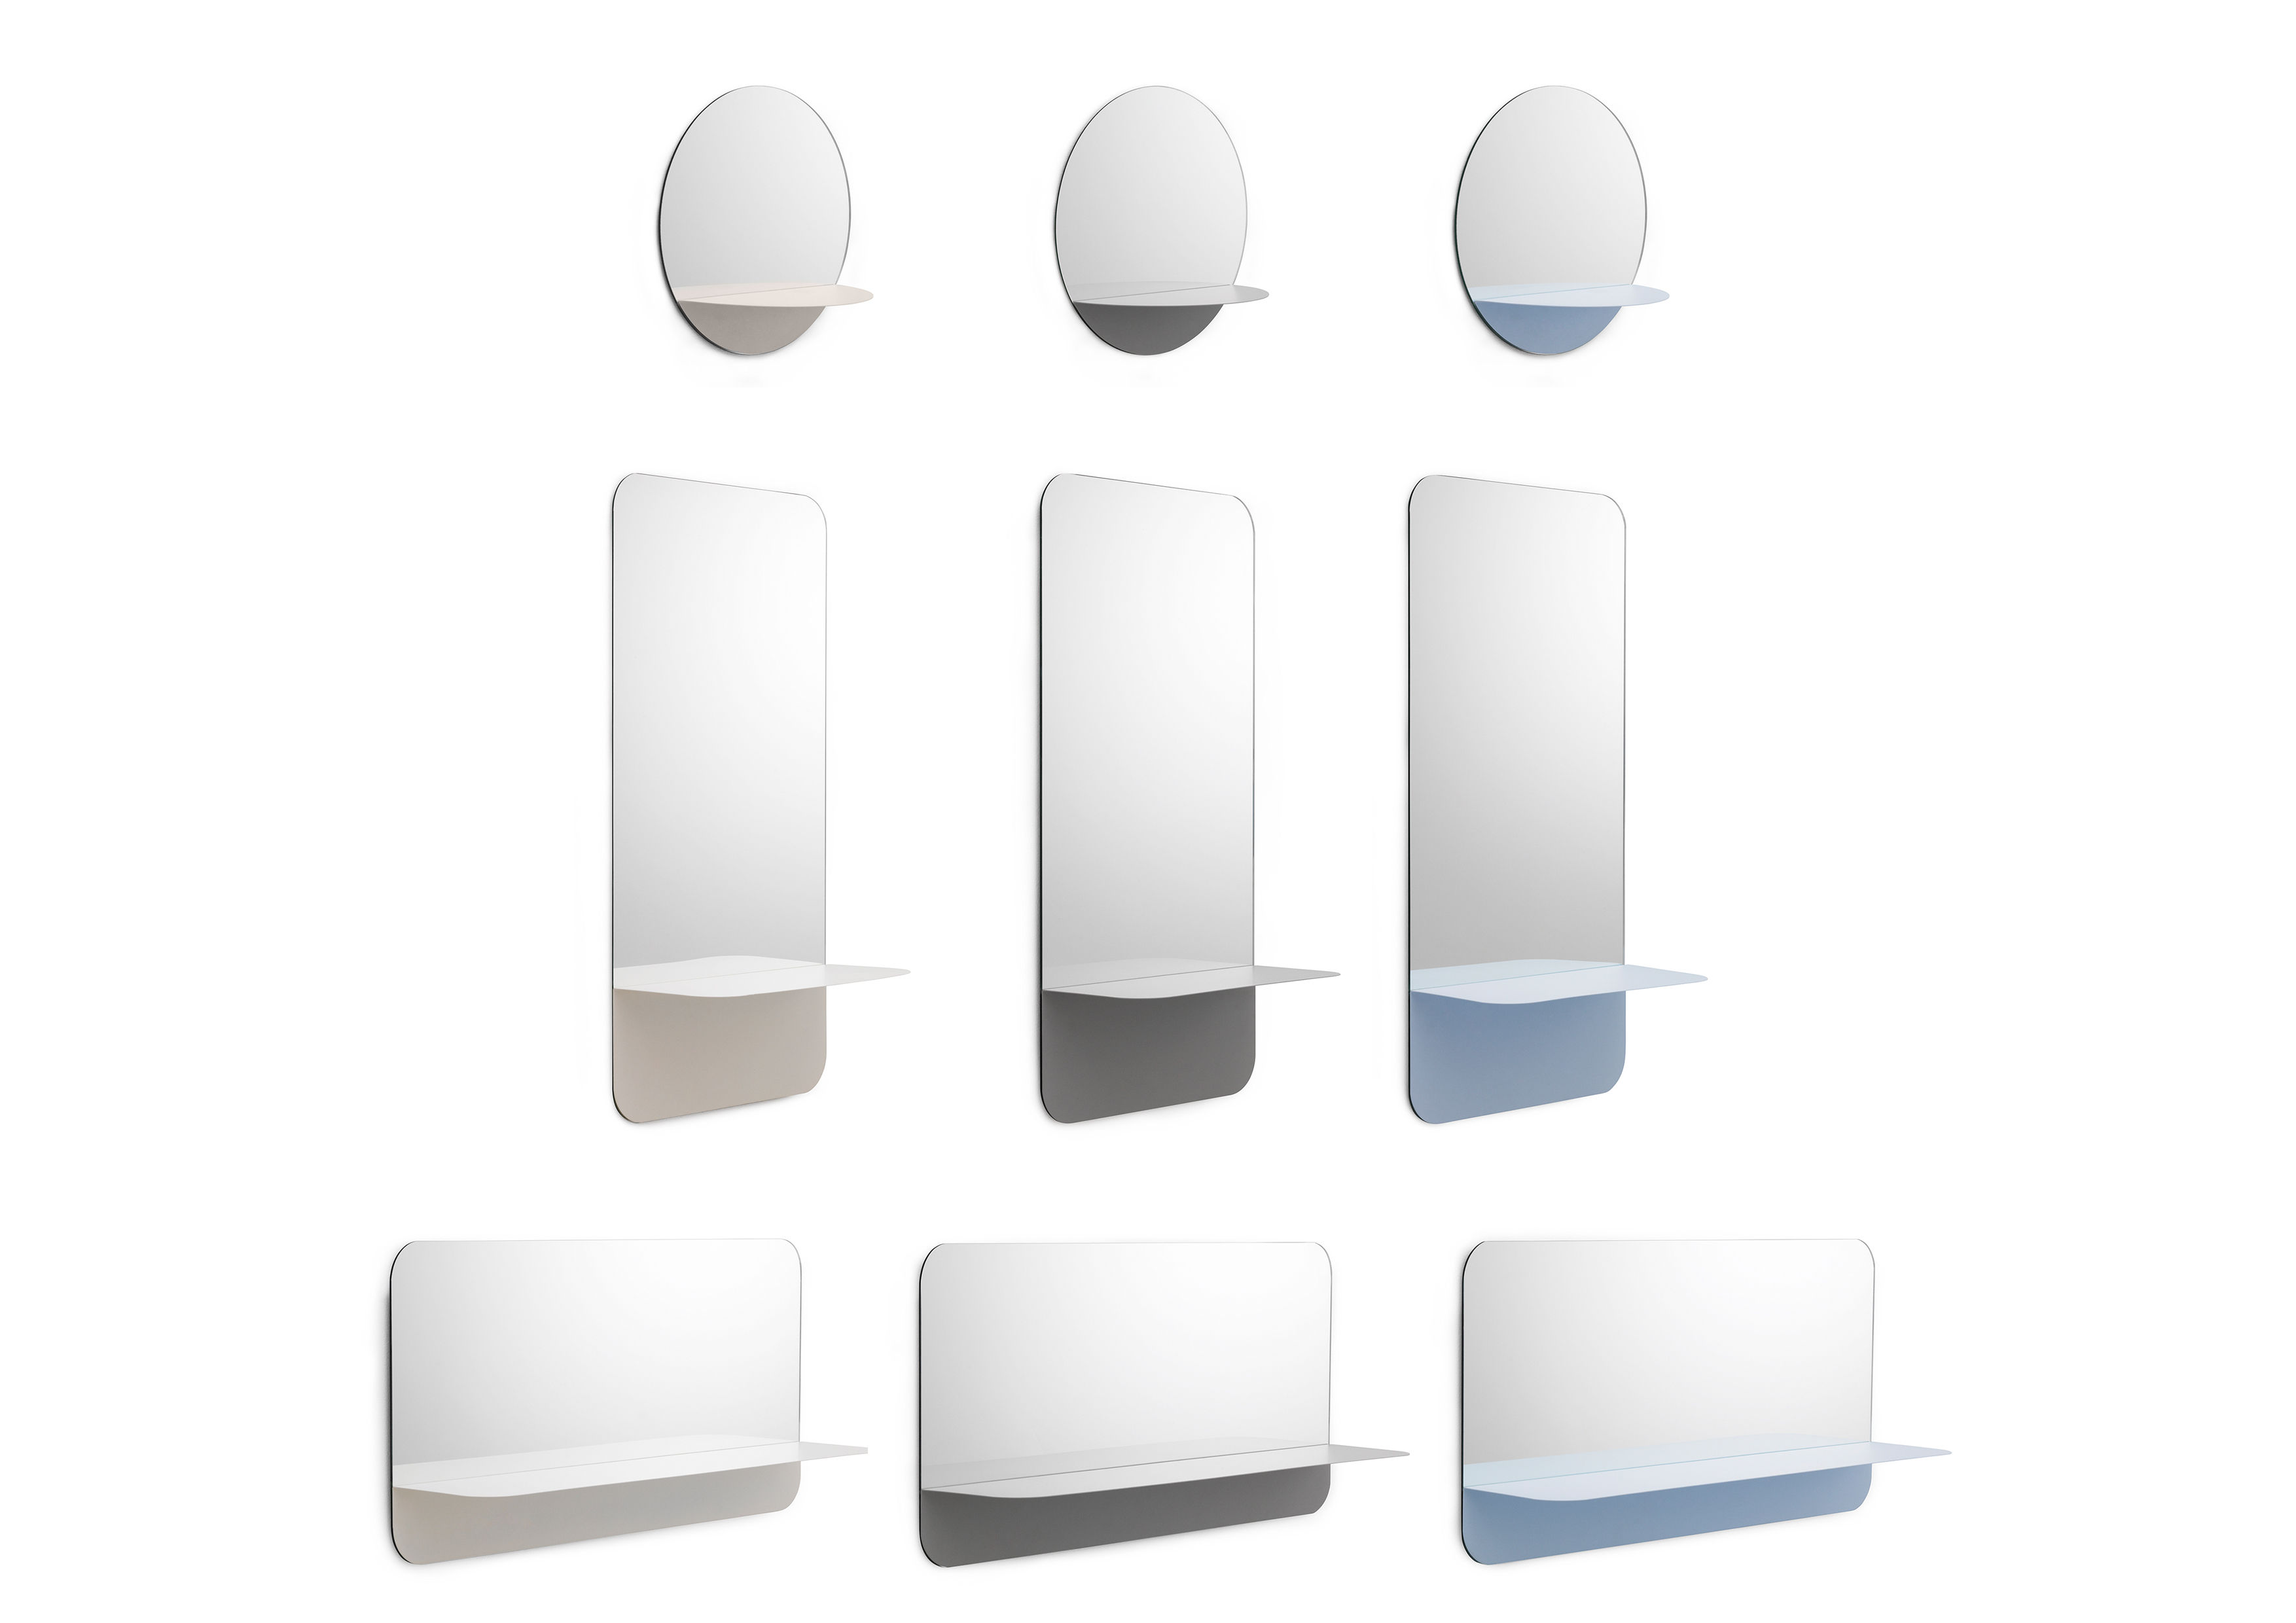 Miroir mural horizon vertical etag re l 40 x h 80 cm for Miroir mural vertical